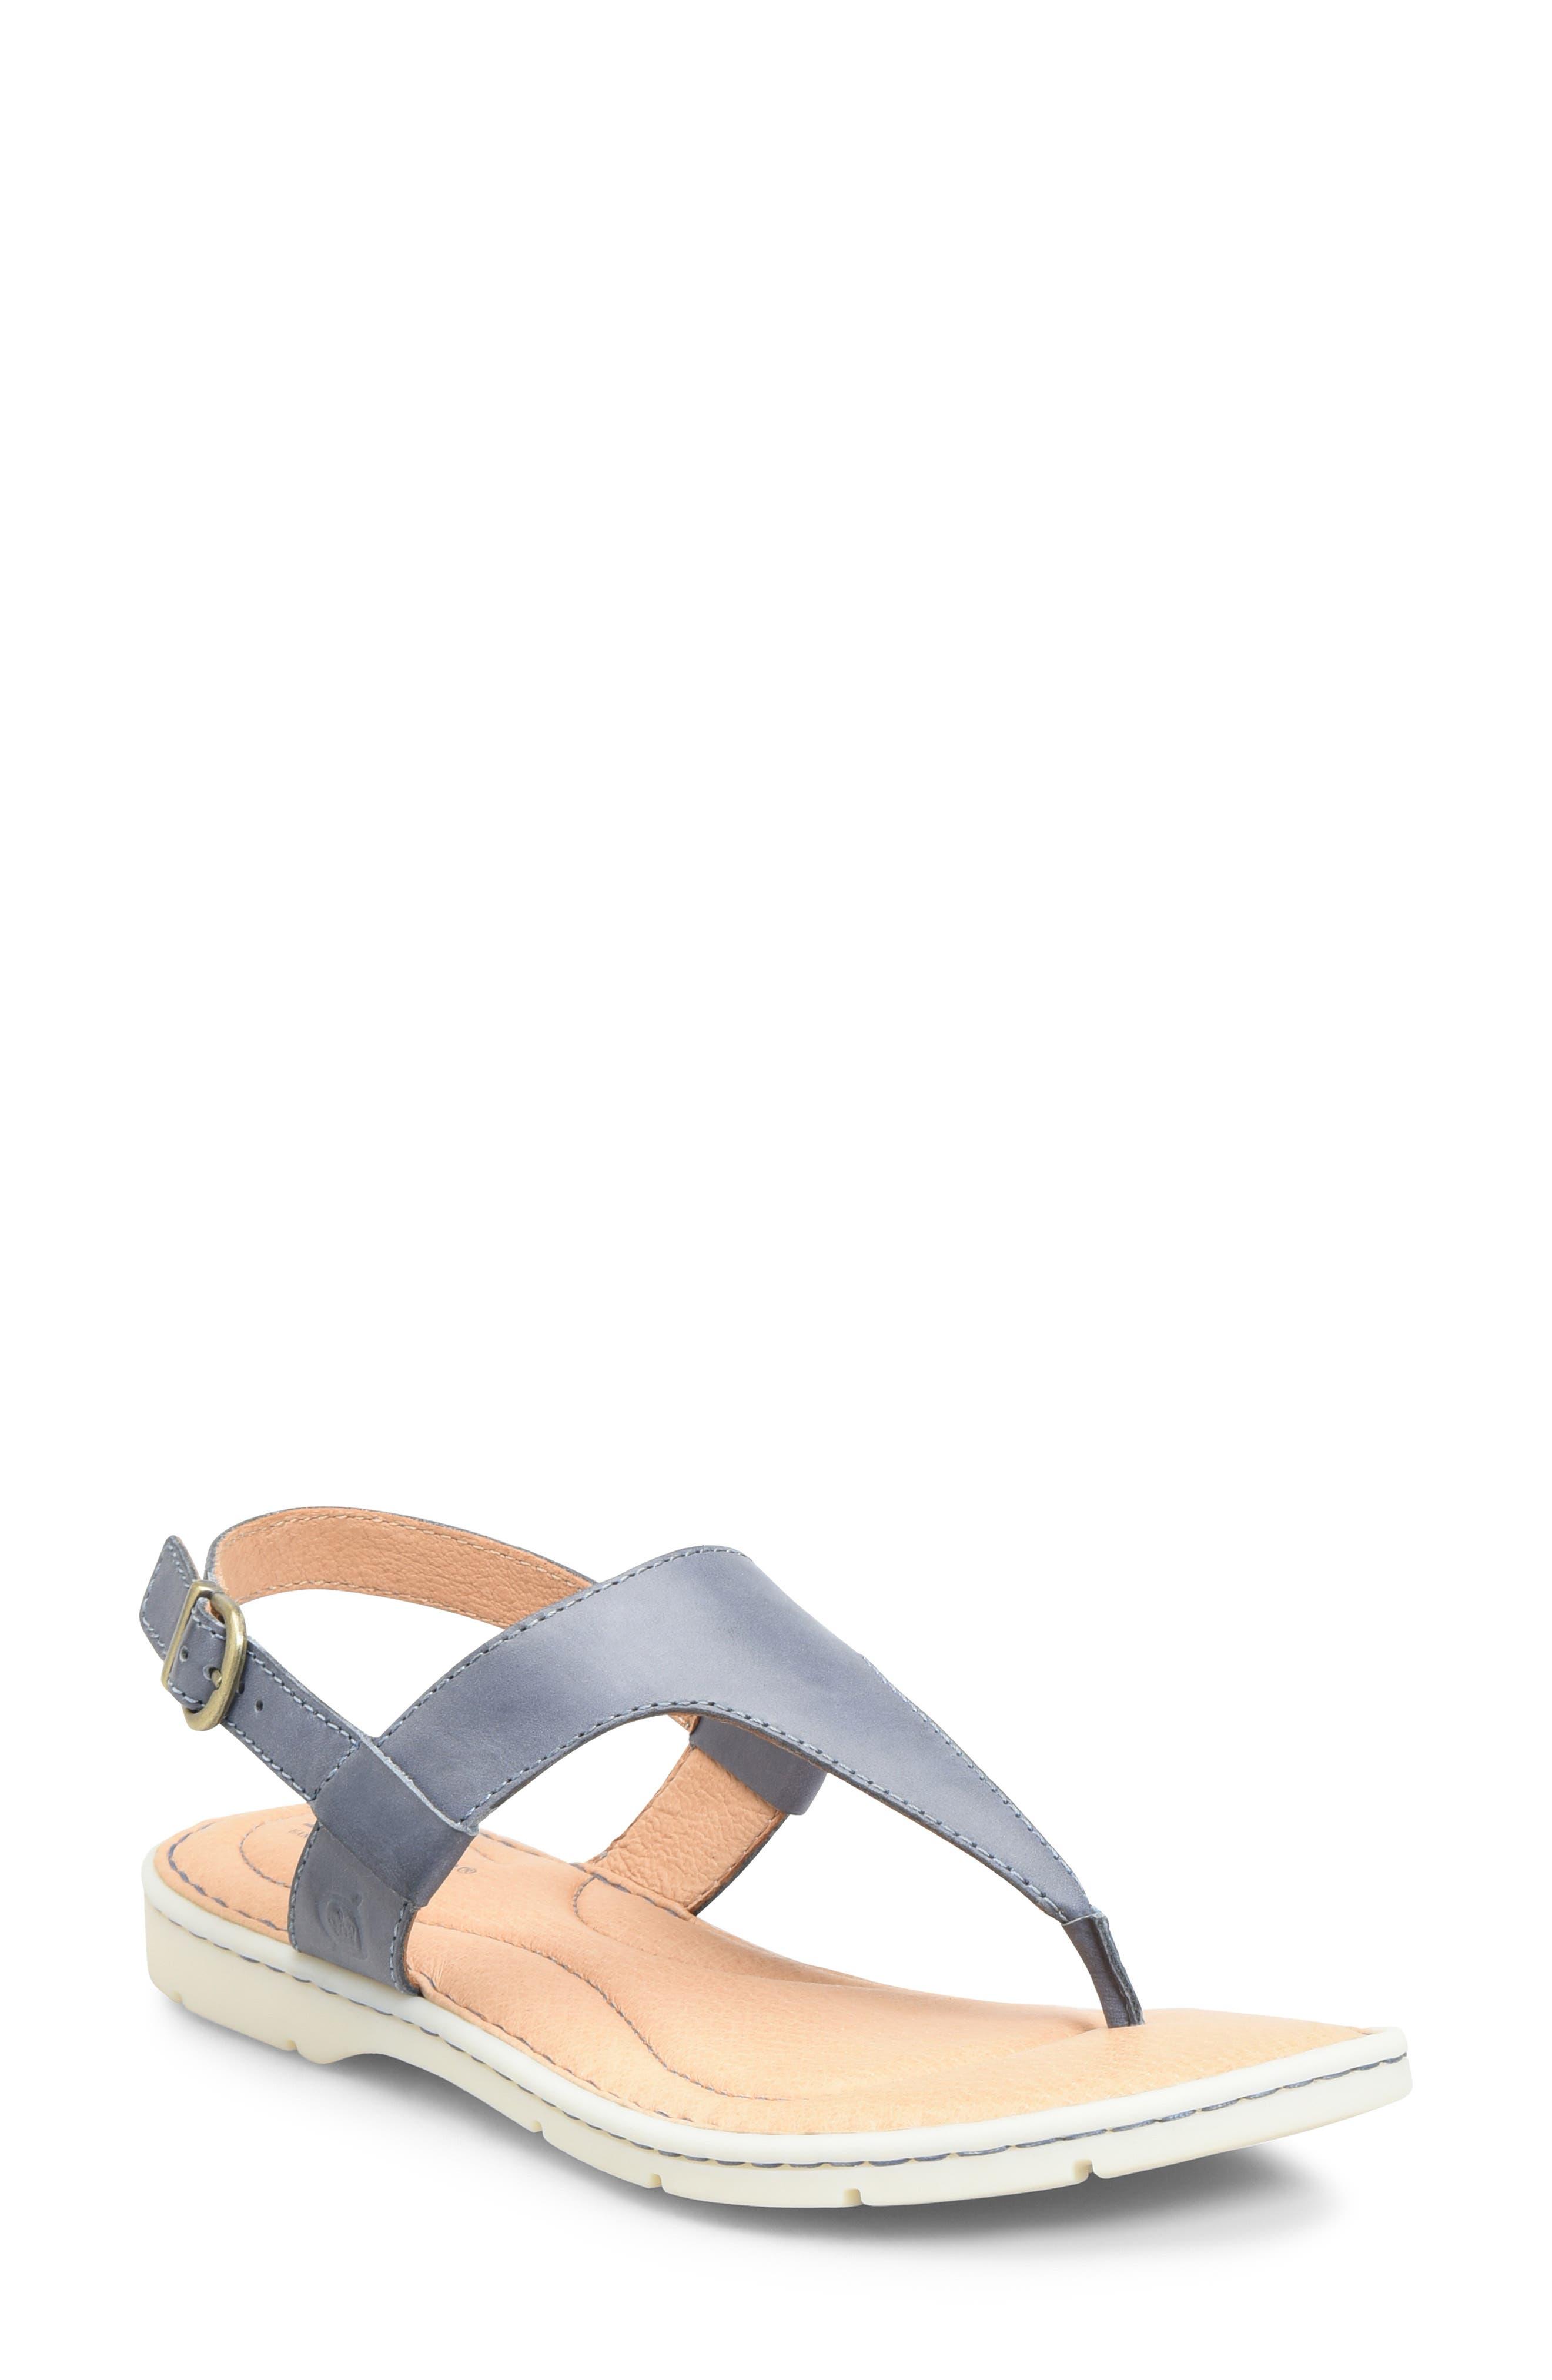 B?rn Taylor V-Strap Sandal, Blue